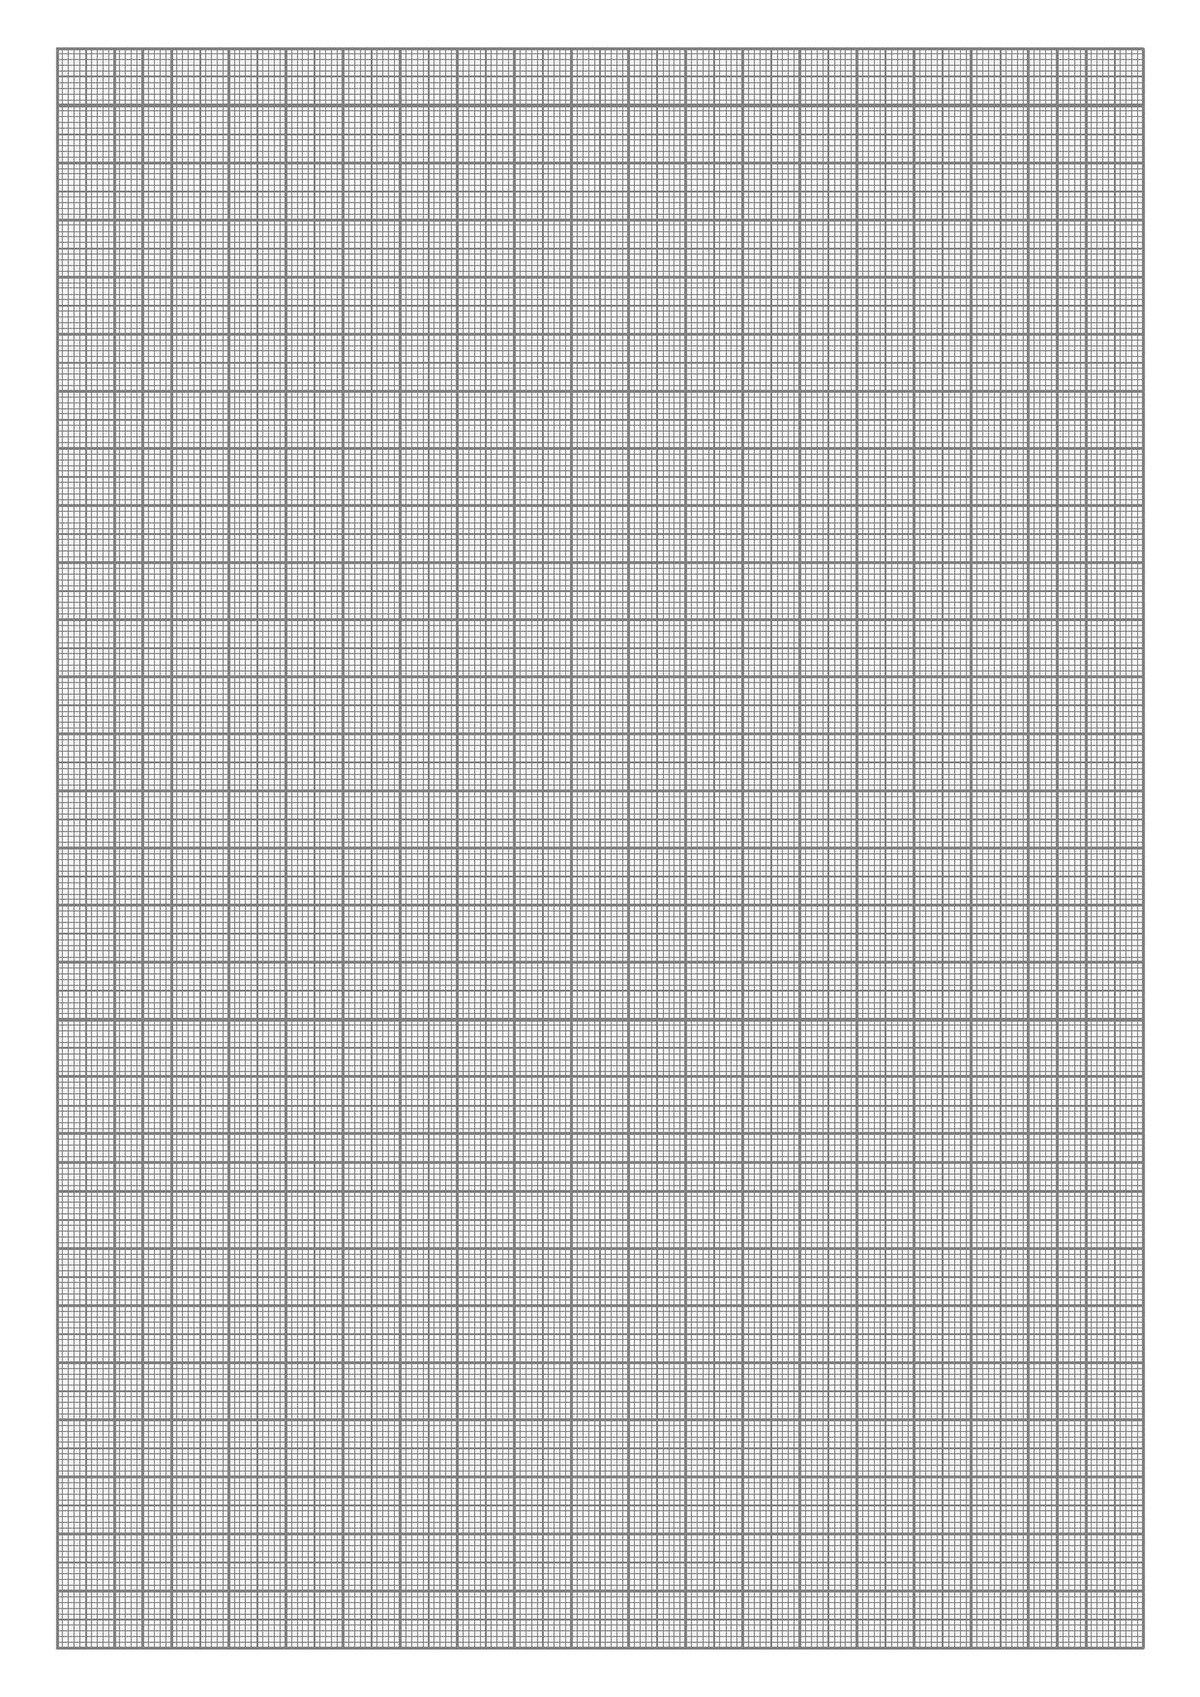 pdf of graph paper